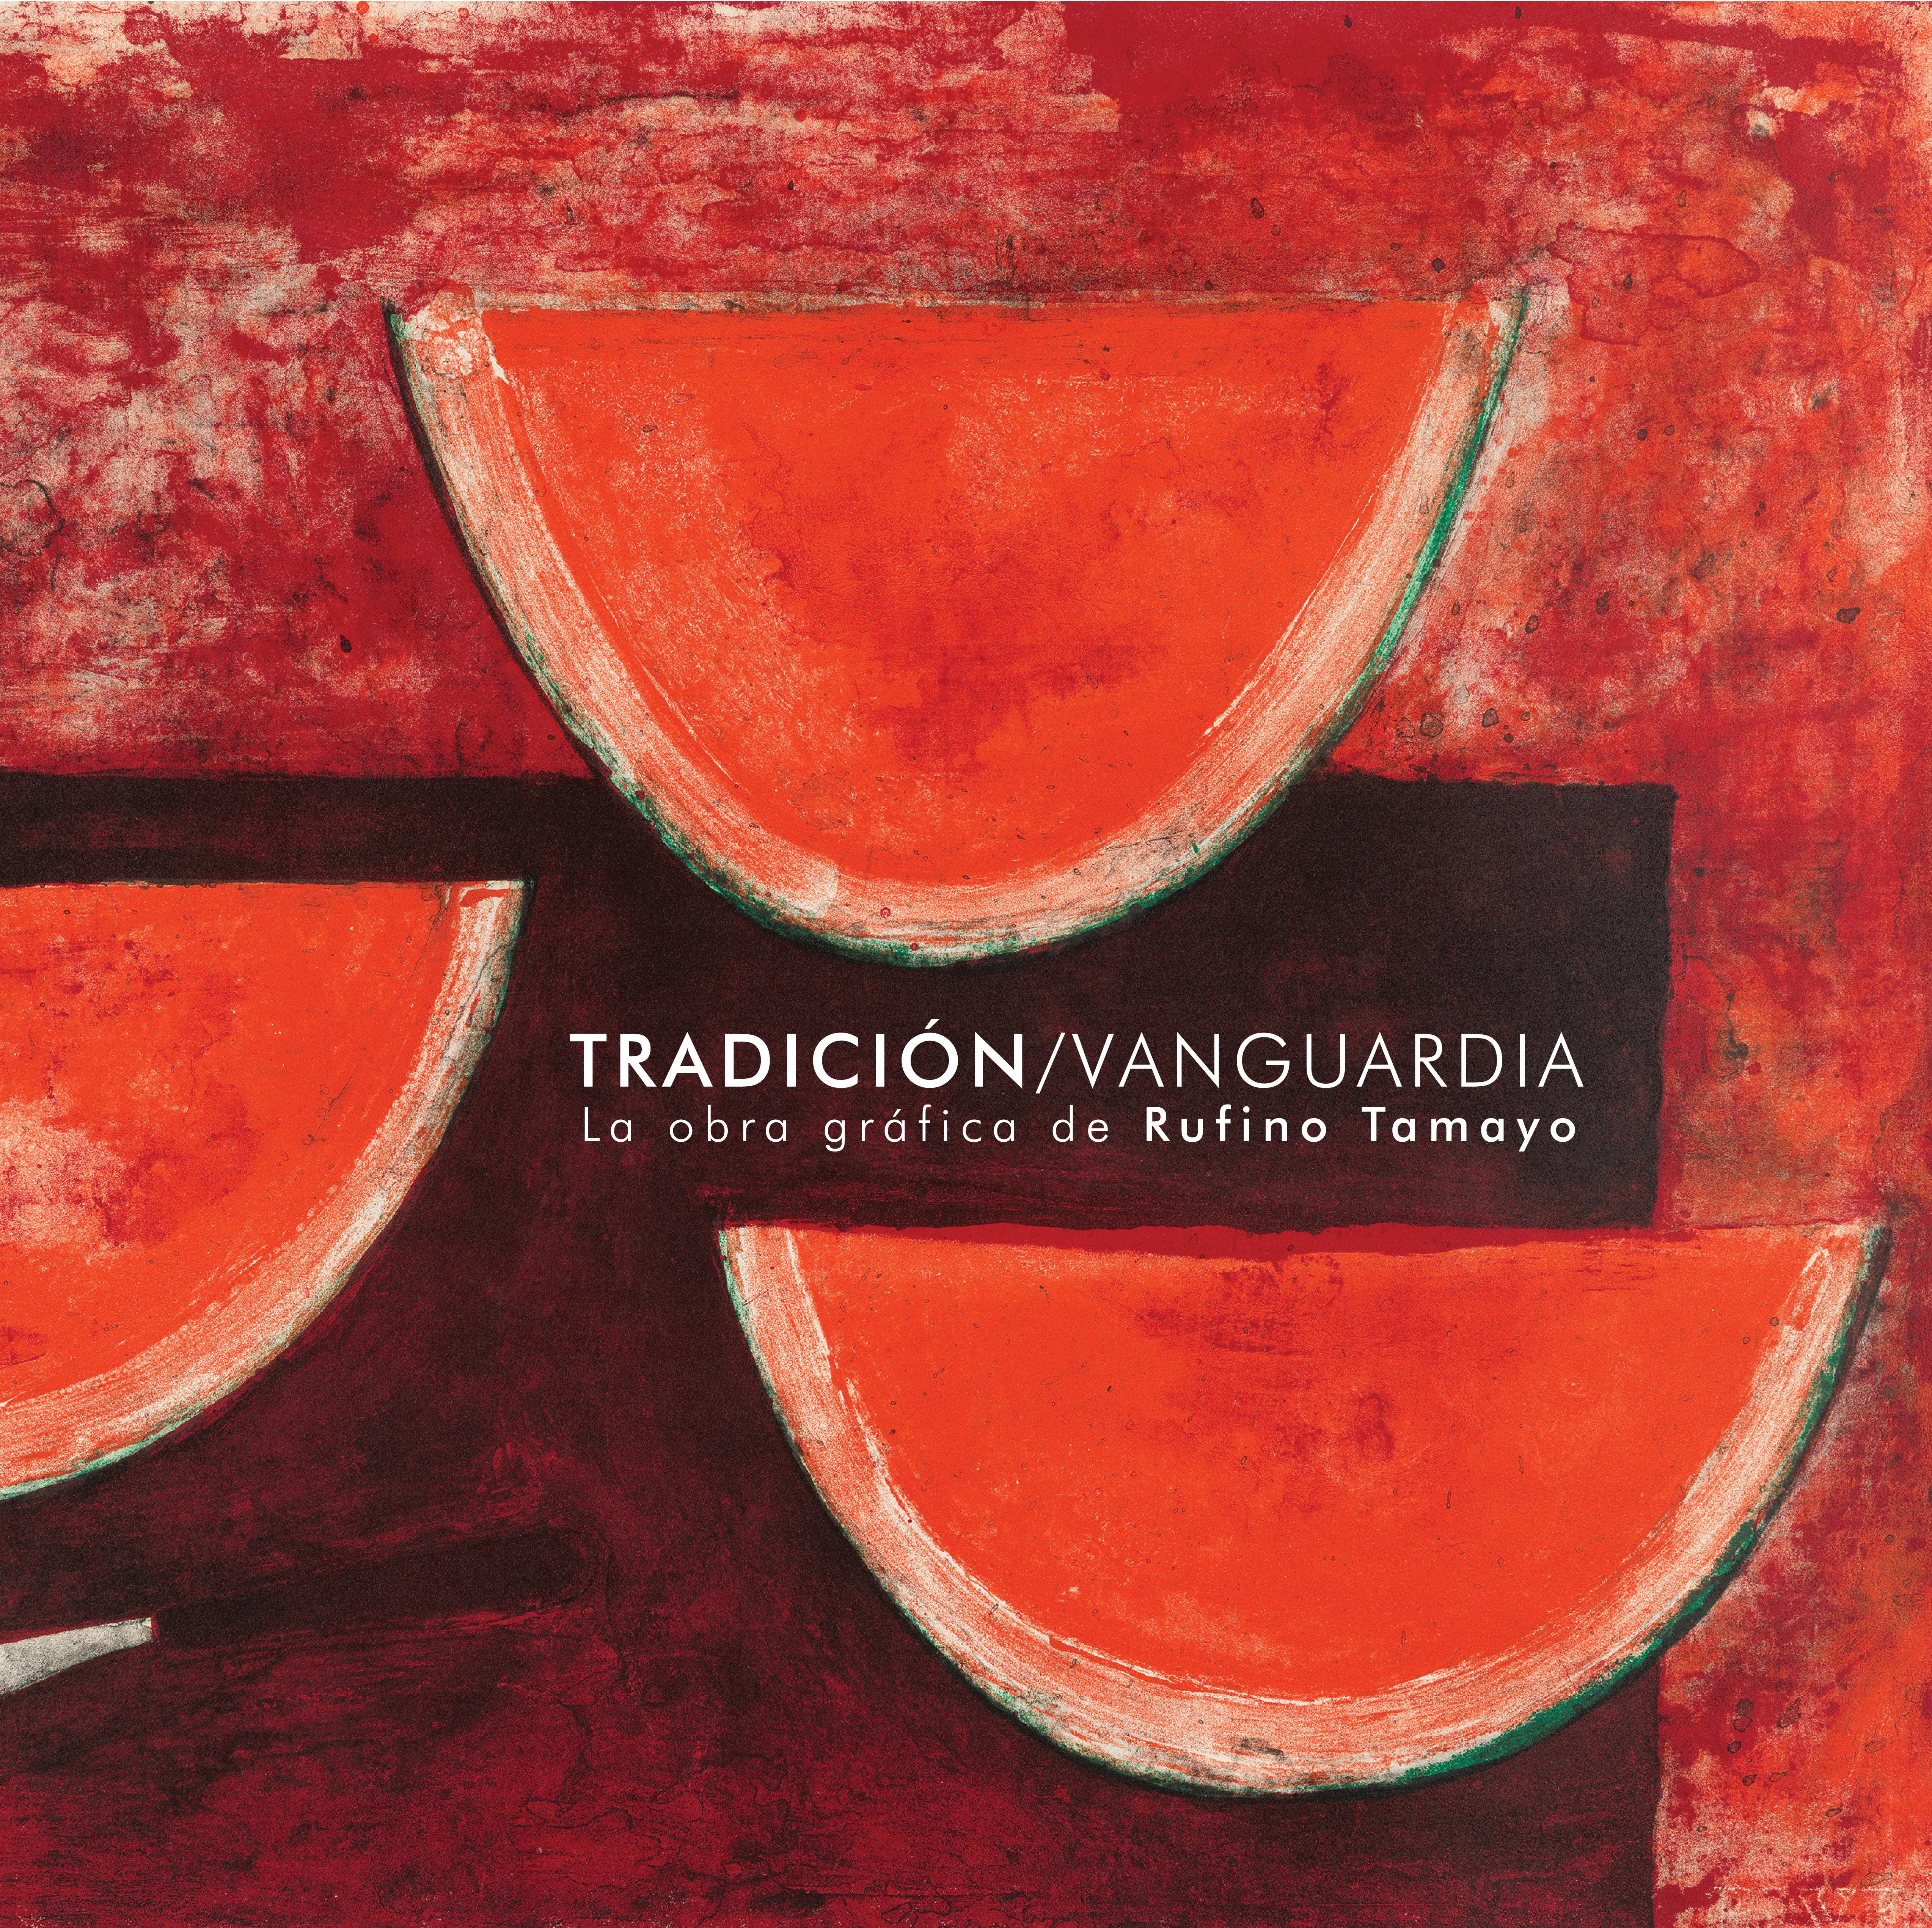 Tradición/Vanguardia